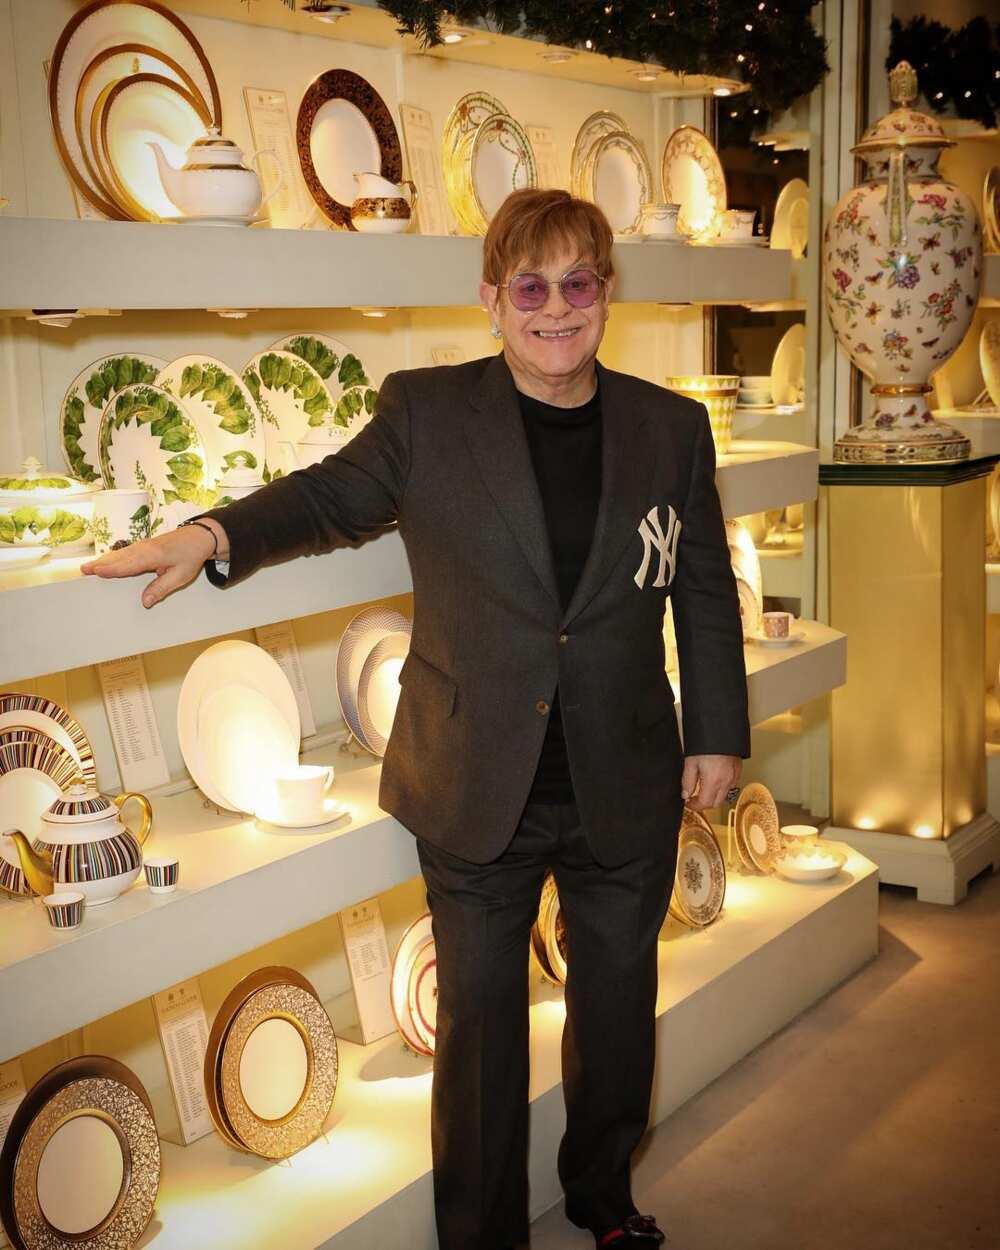 How tall is Elton John?